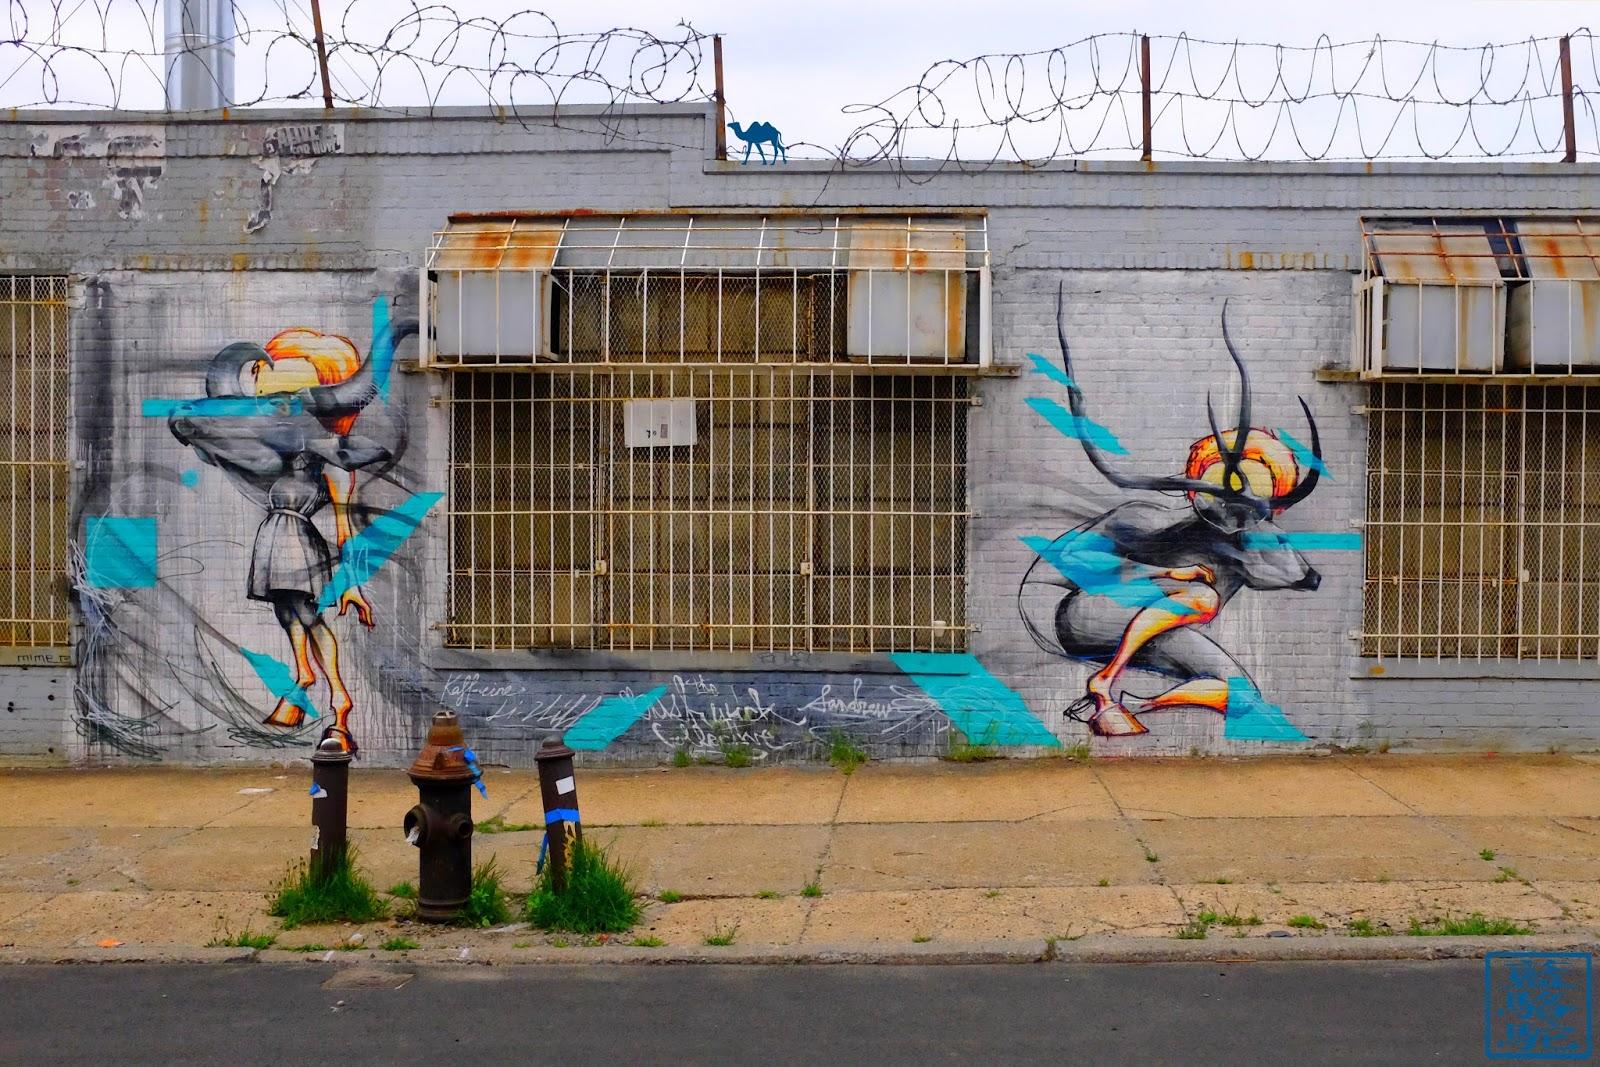 Le Chameau Bleu - Minautaures - Bushwick - Street Art - Brooklyn